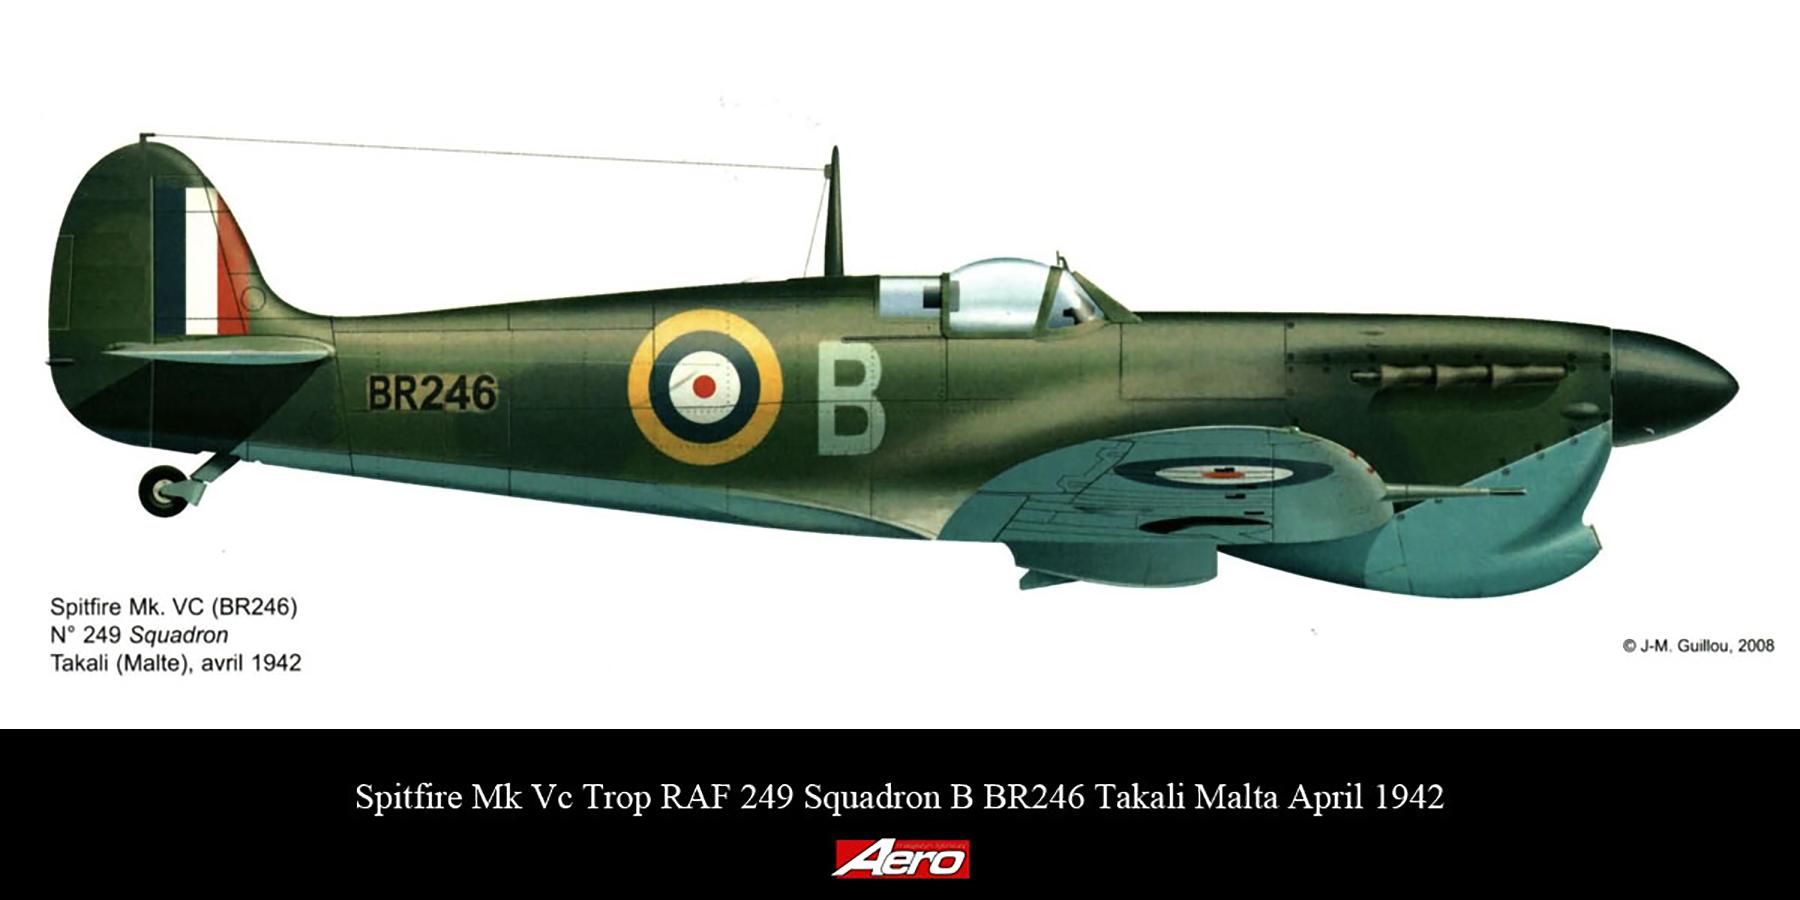 Spitfire MkVcTrop RAF 249Sqn B BR246 Takali Malta April 1942